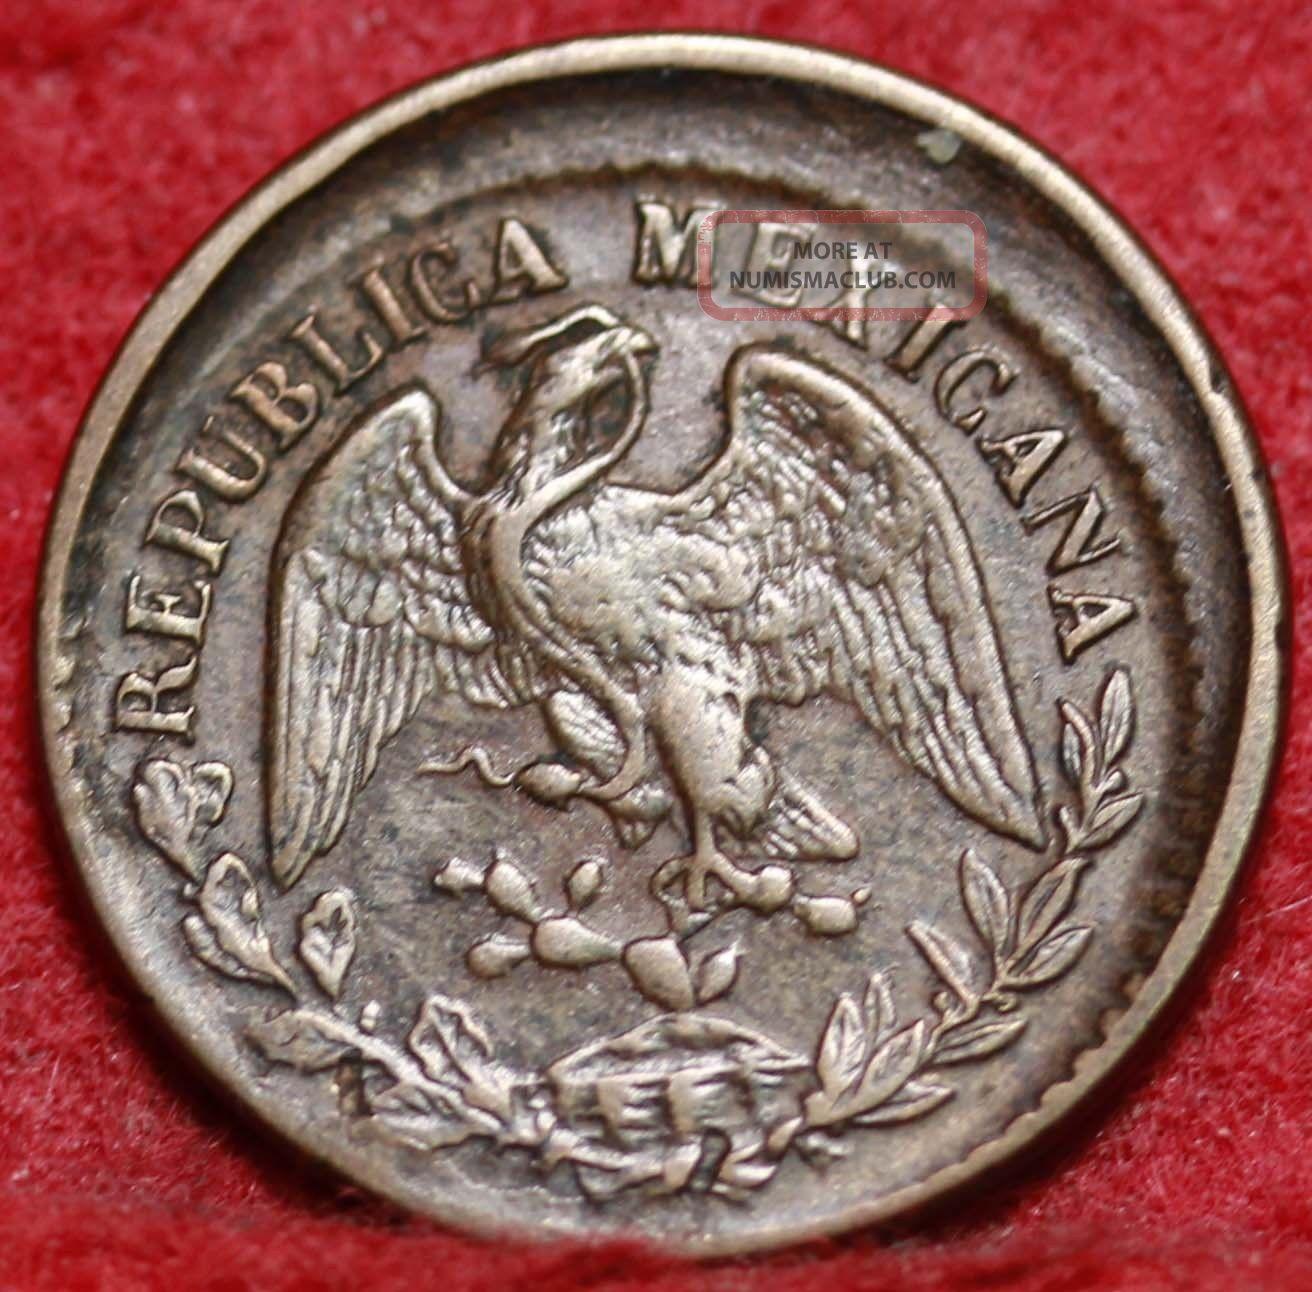 1901 - M Mexico 1 Centavo Off - Center Error Foreign Coin S/h Coins: World photo